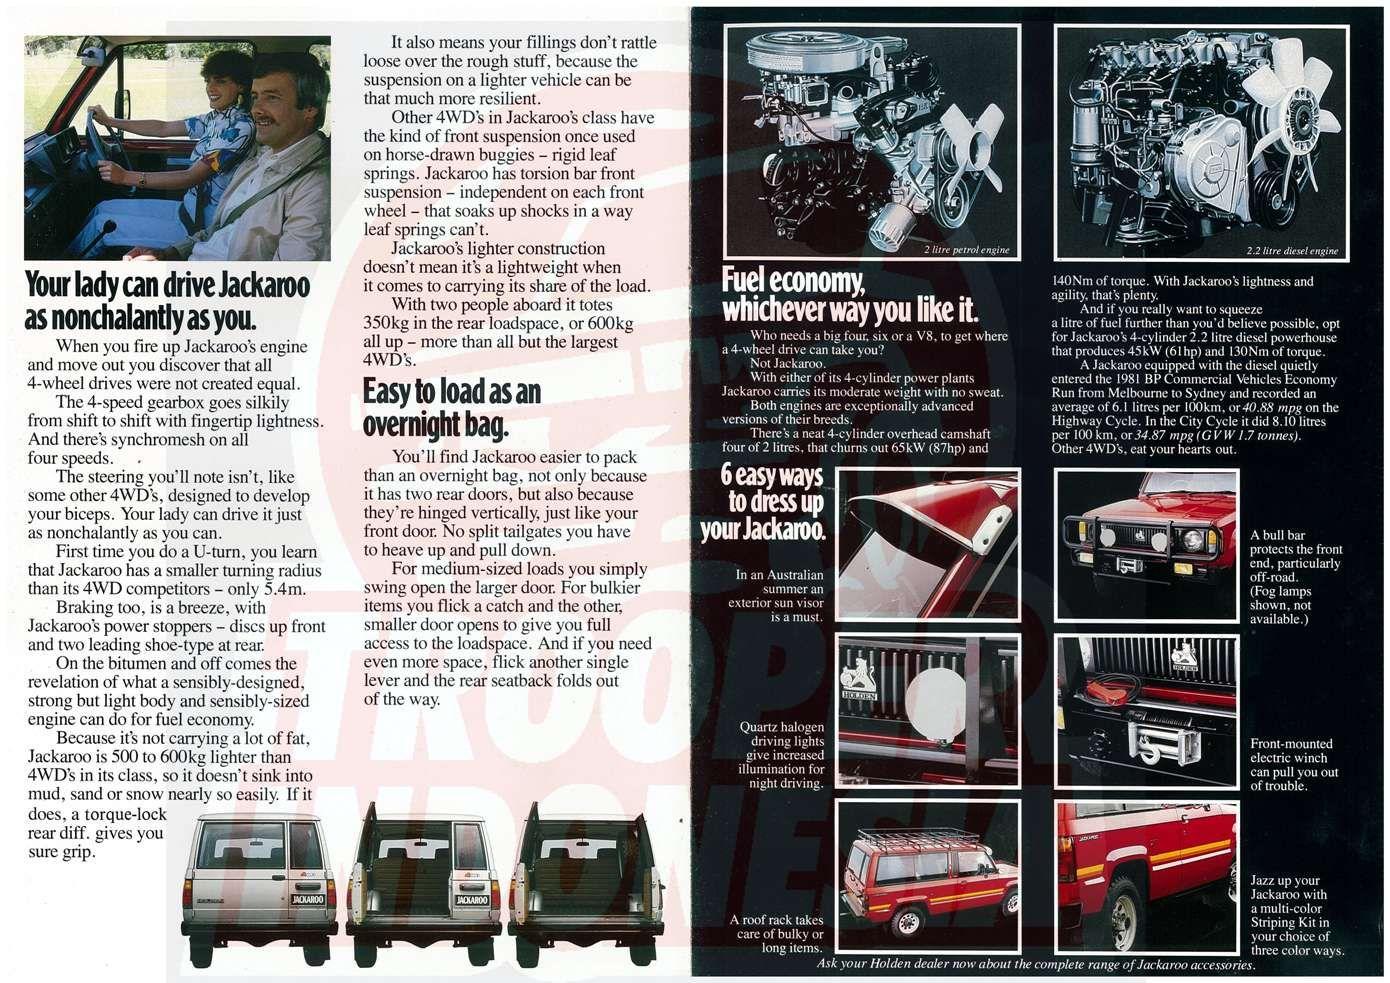 Holden_Jackaroo_1982_p6.jpg